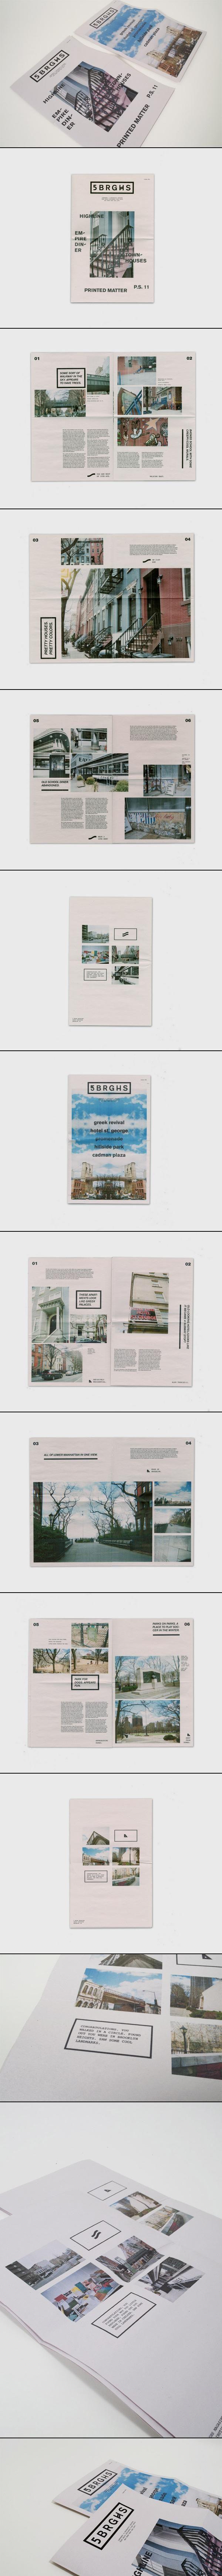 3 page essay on graphic designer?